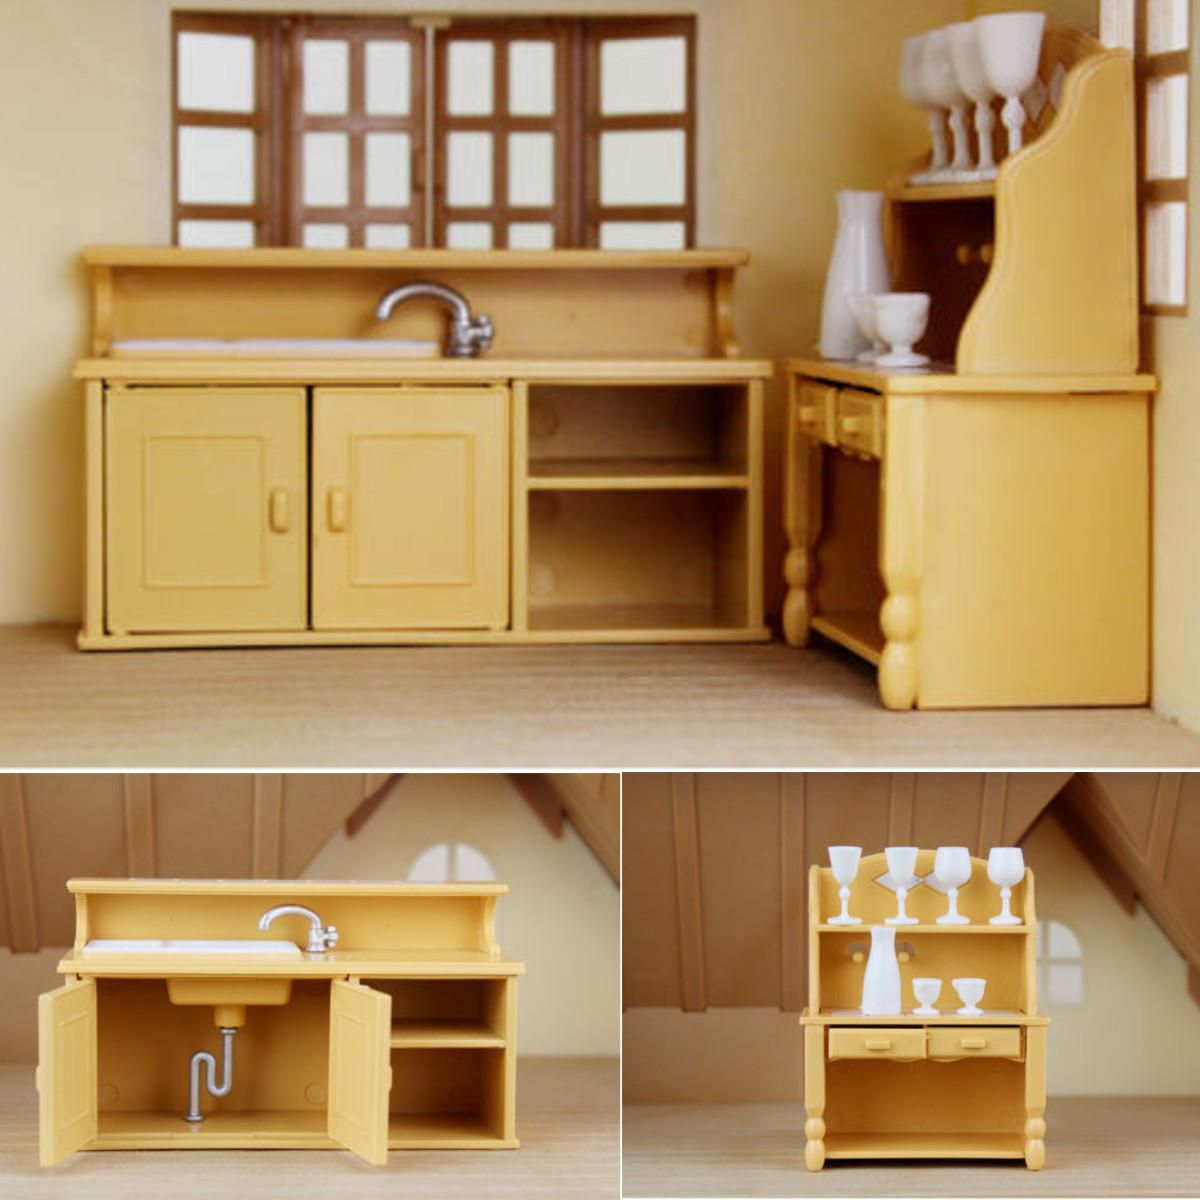 Buy Kitchen Furniture Online: Cabinets Plastic Kitchen Miniature DollHouse Furniture